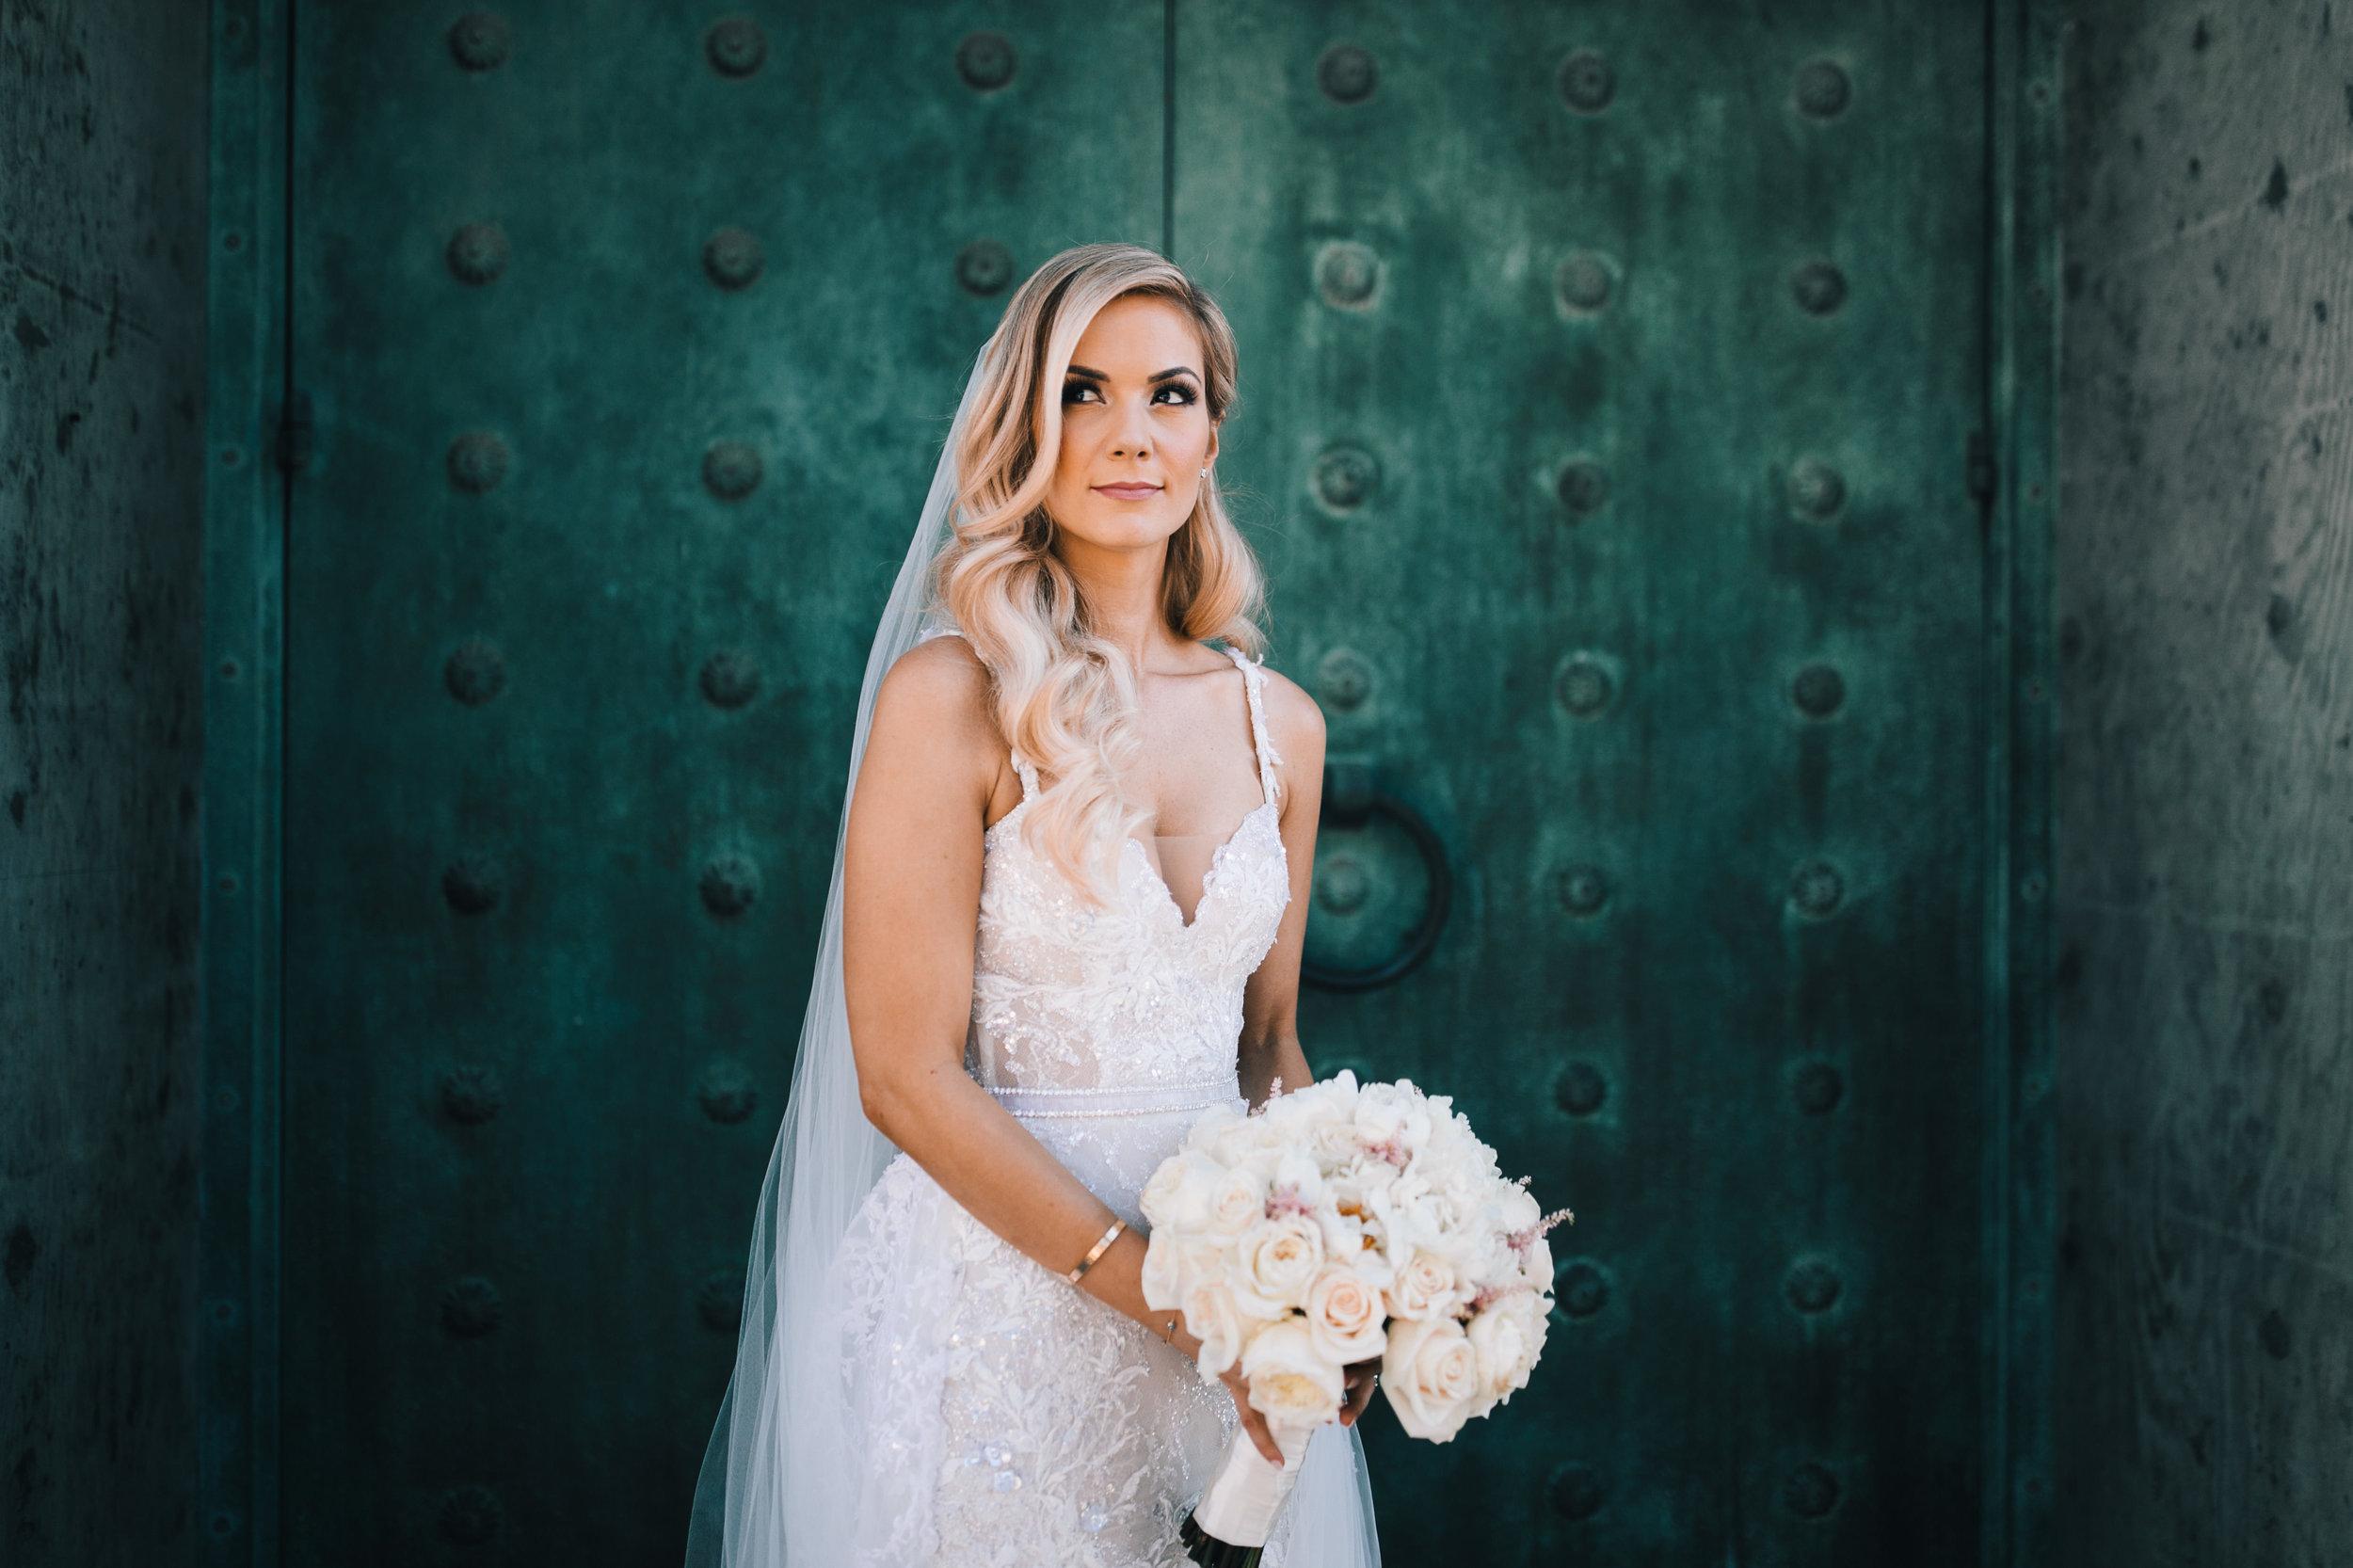 2018.09.08 Litsa and Sofo Greek Wedding Sneak Peak-1.jpg